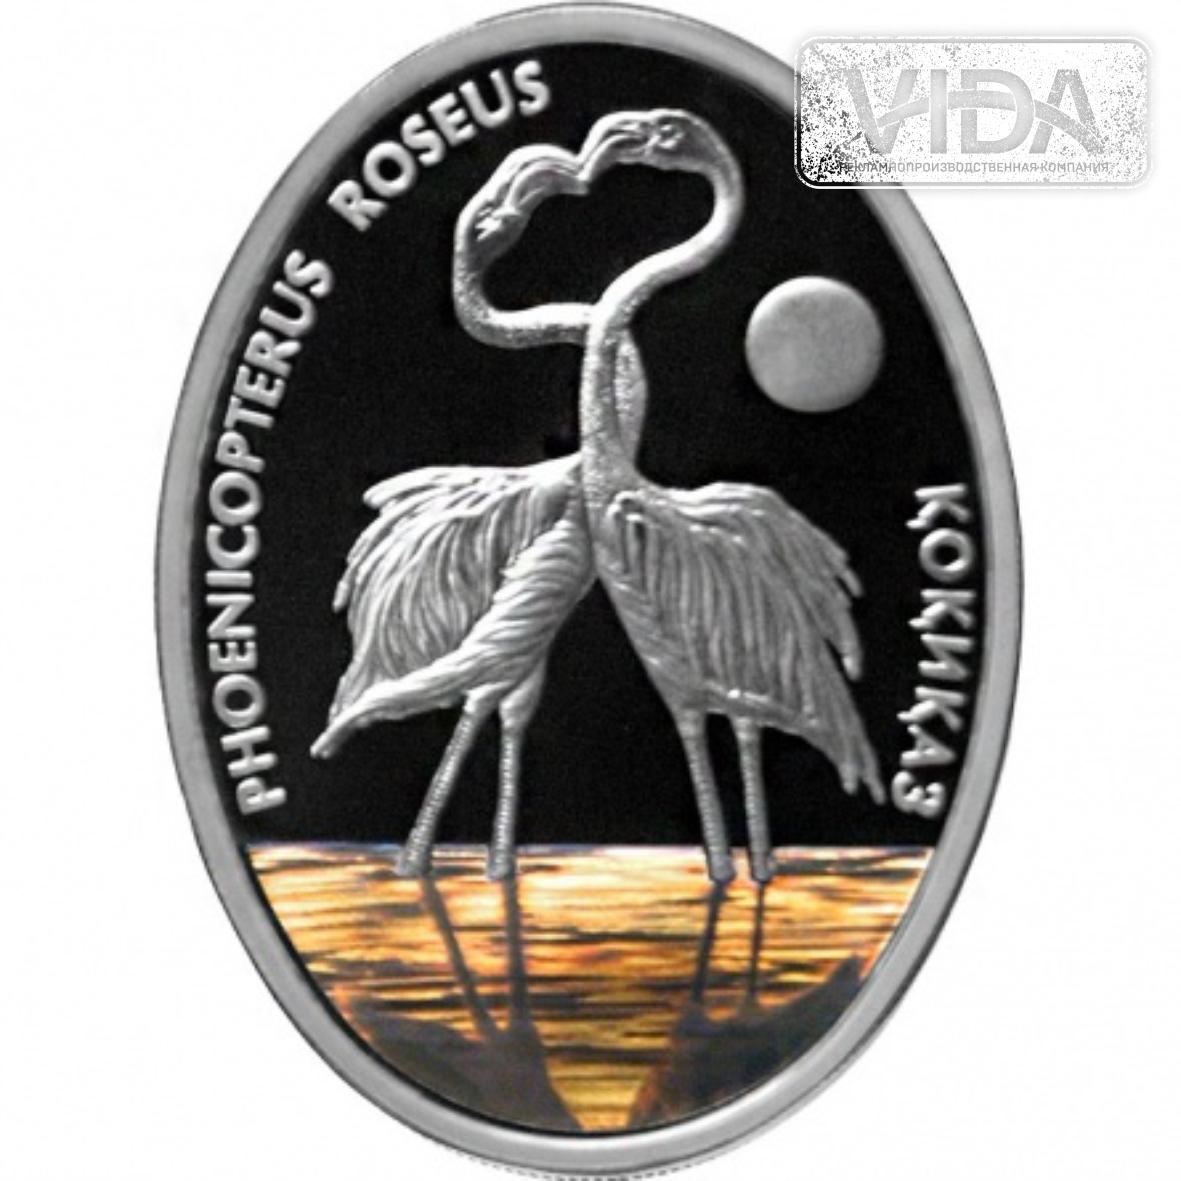 Фламинго - 500 тенге (Серебро 925) 24гр.